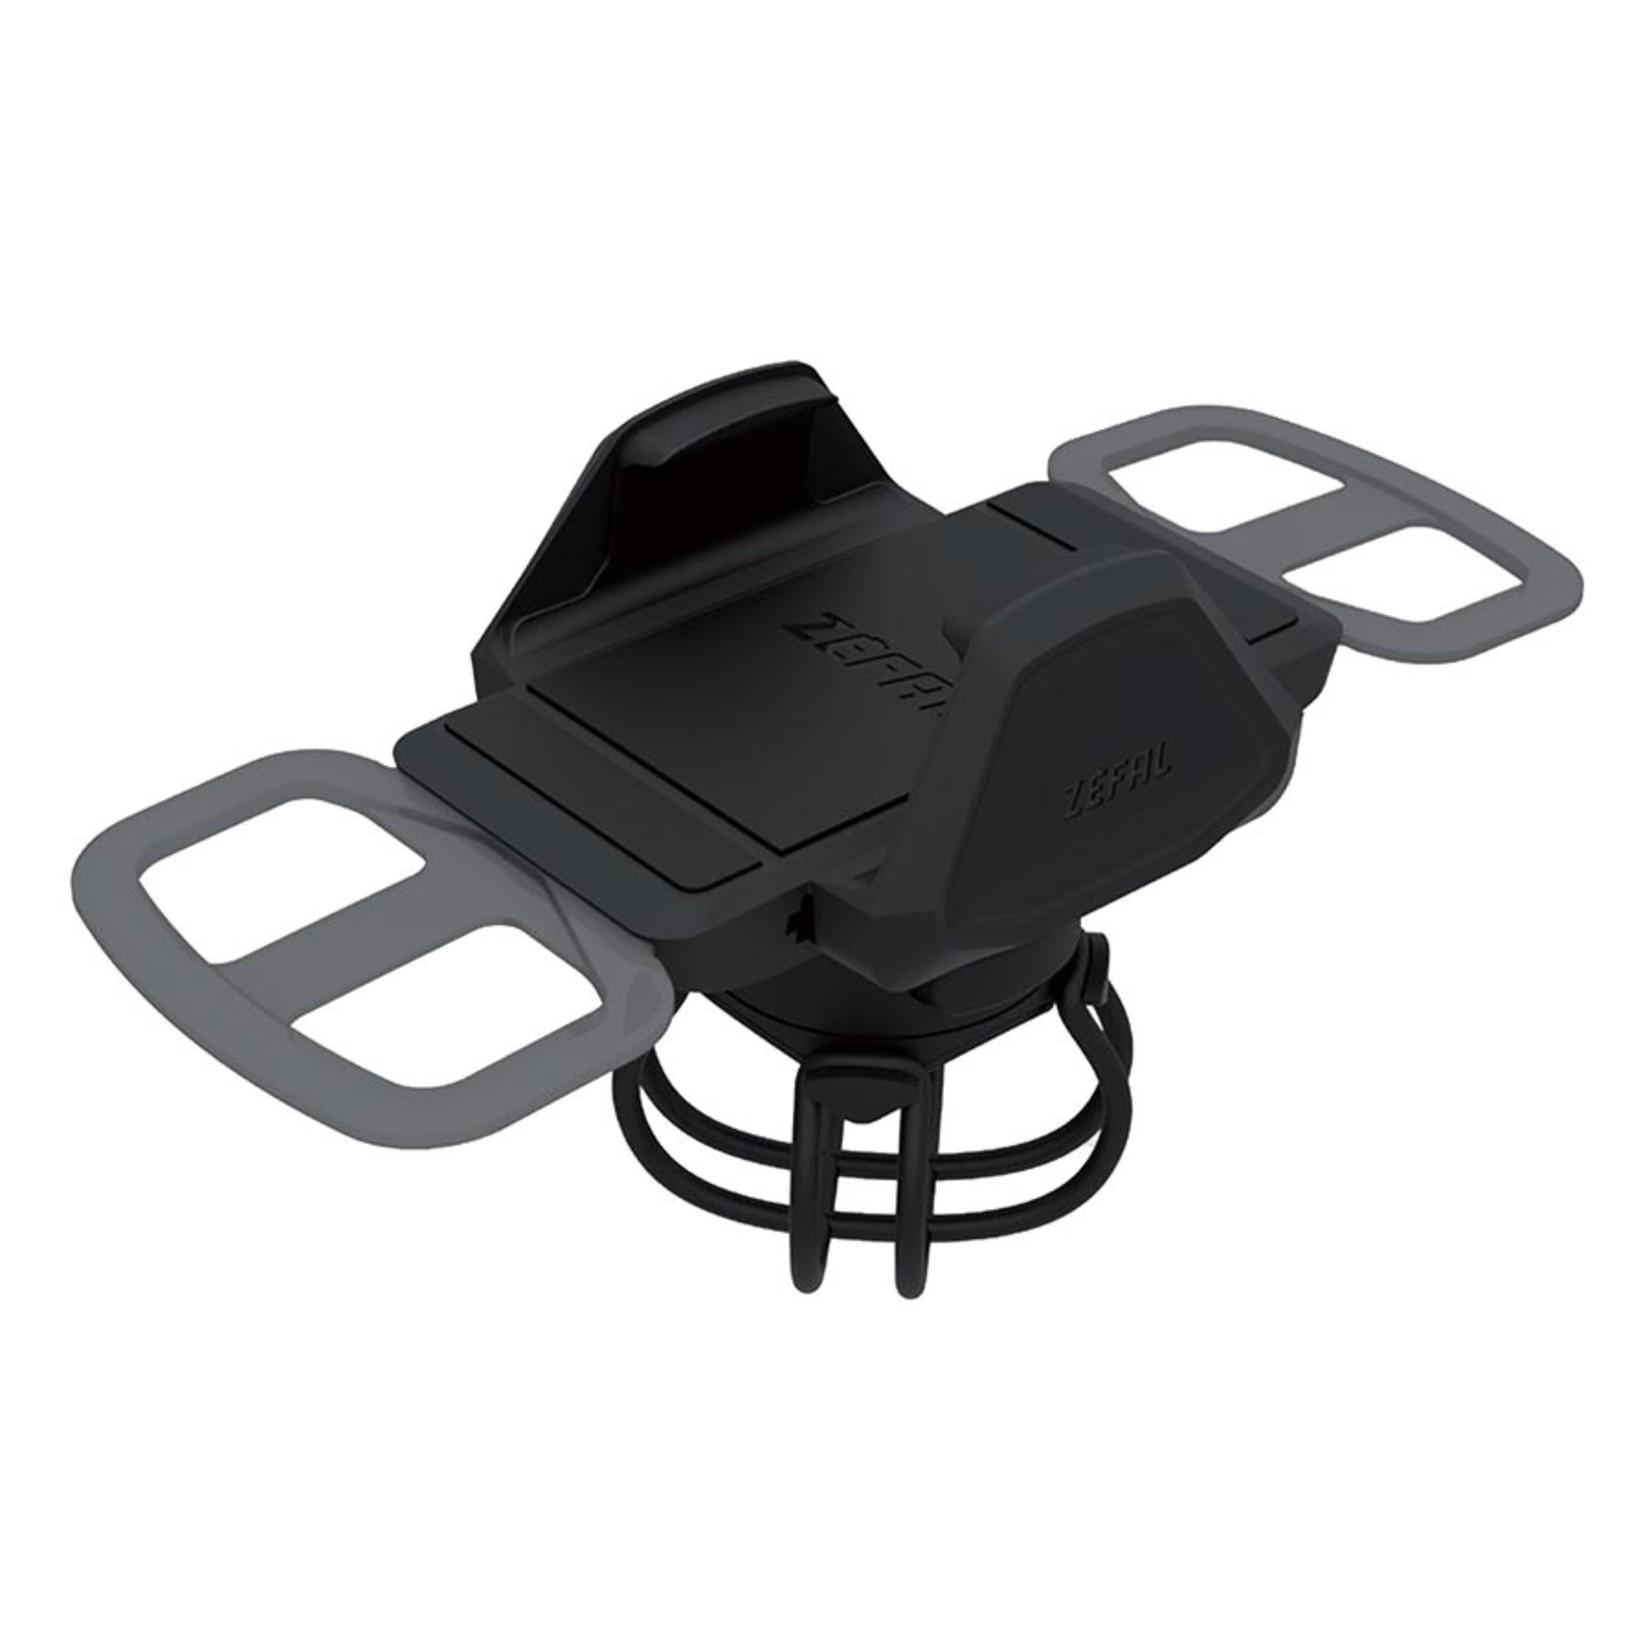 Zefal Universal Phone Holder Bike Kit